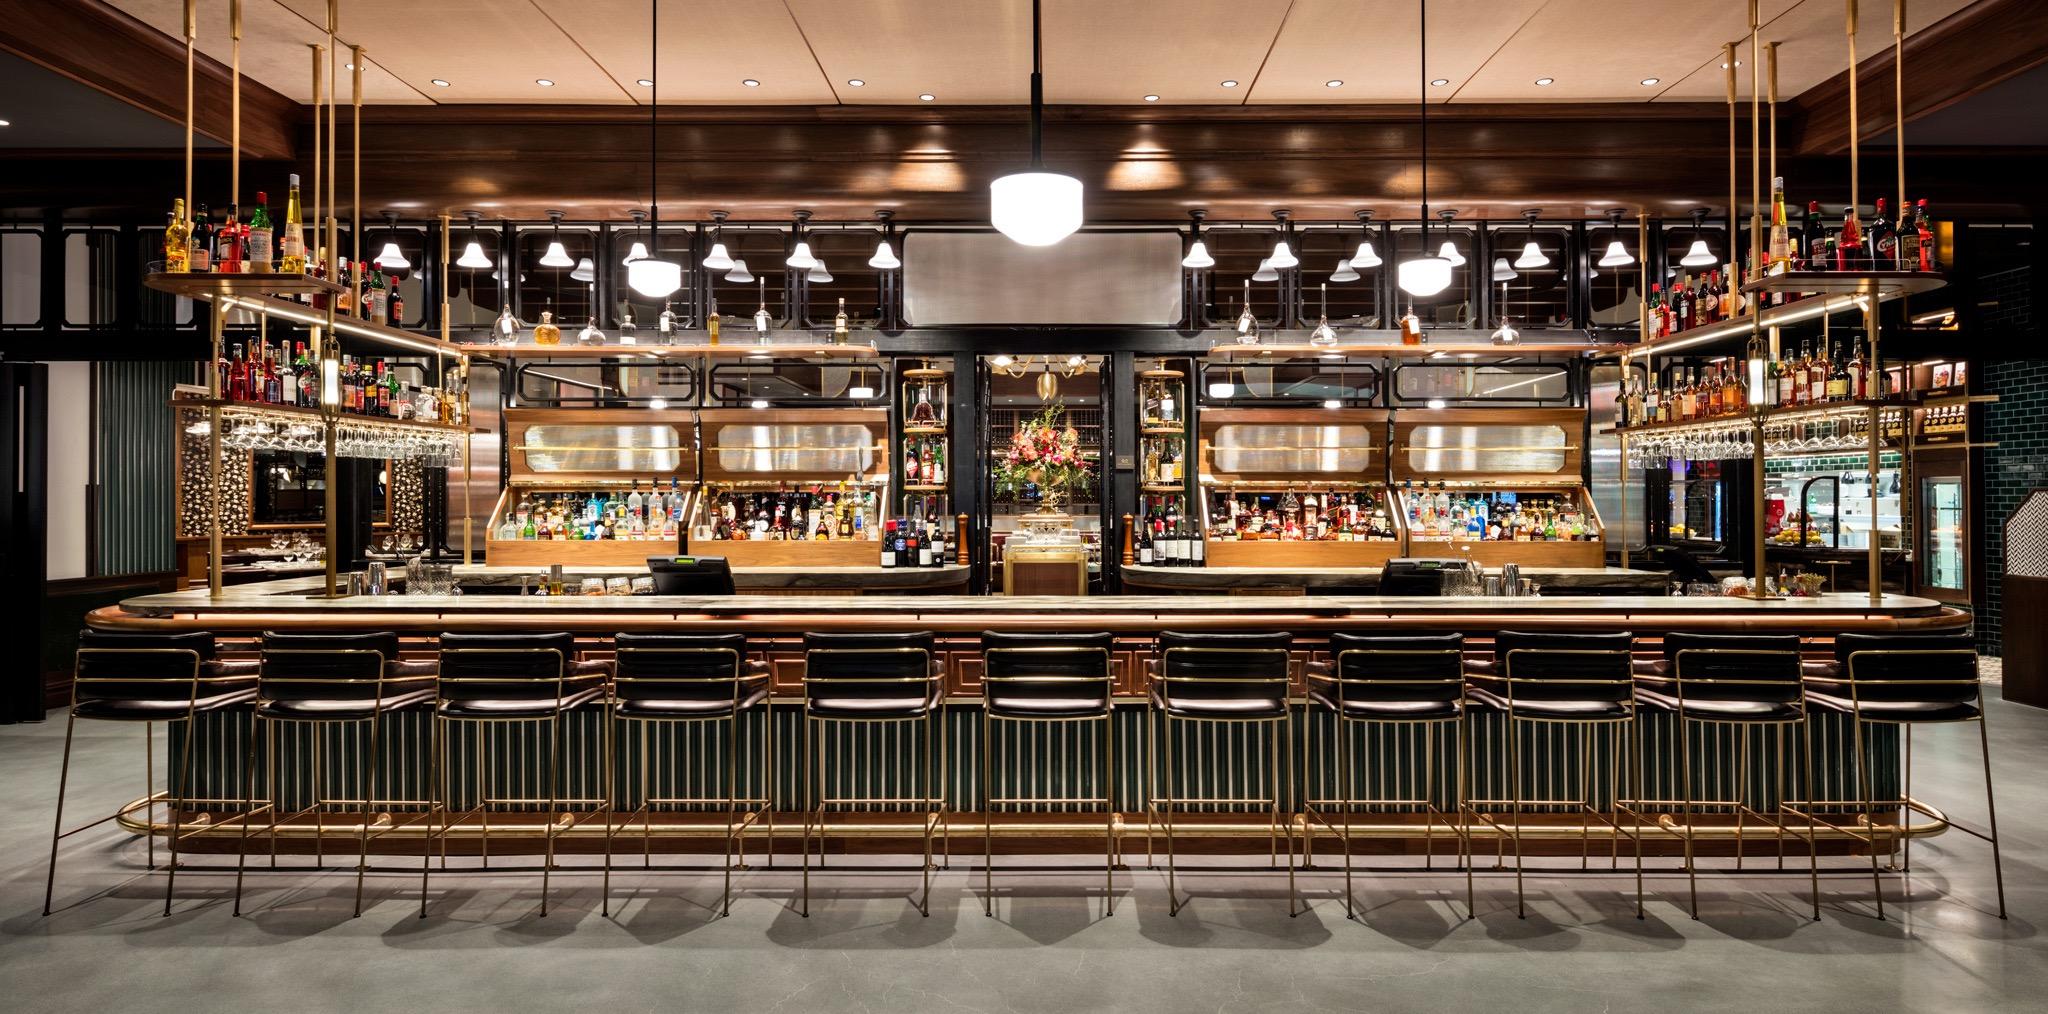 Best Restaurants For Bachelor Party Atlantic City